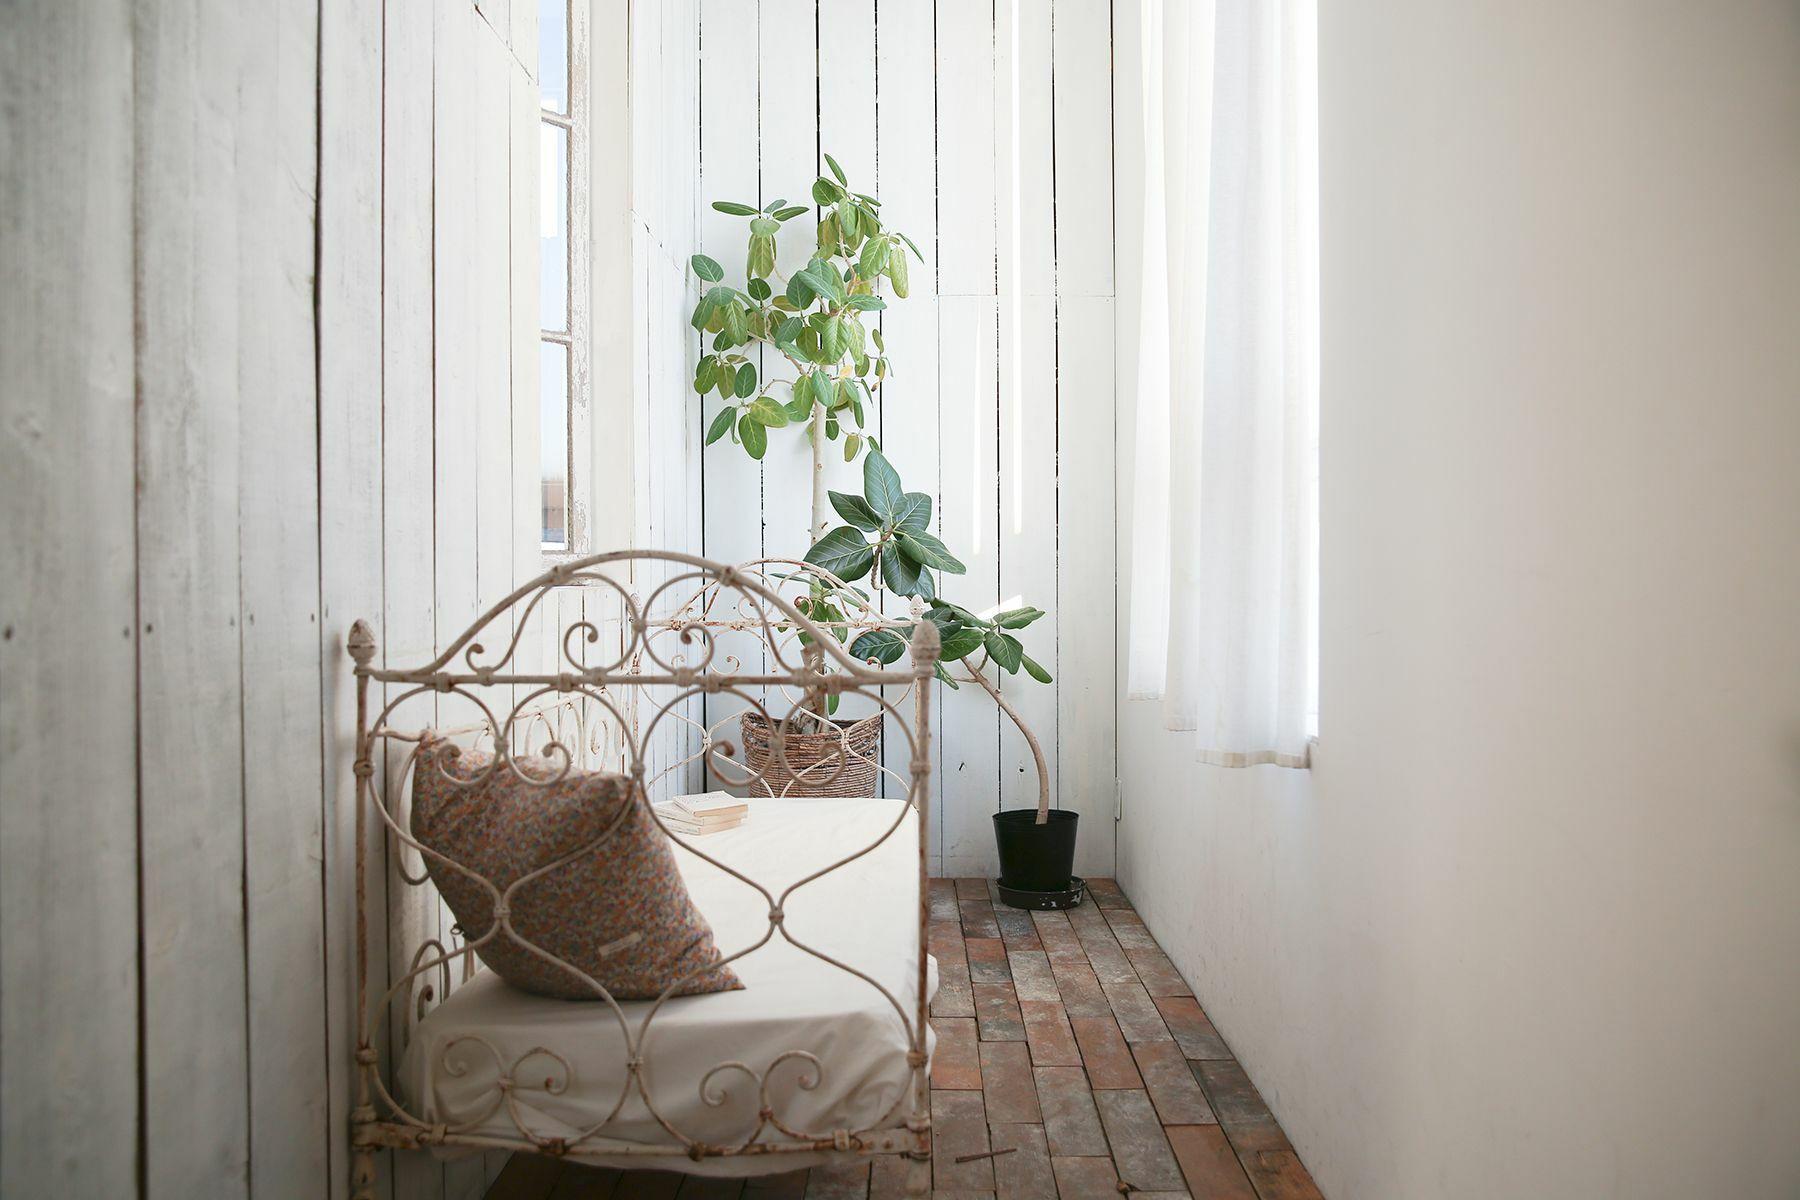 Atelier NORA 大森 (アトリエ ノラ)2F/背面式キッチン使用可